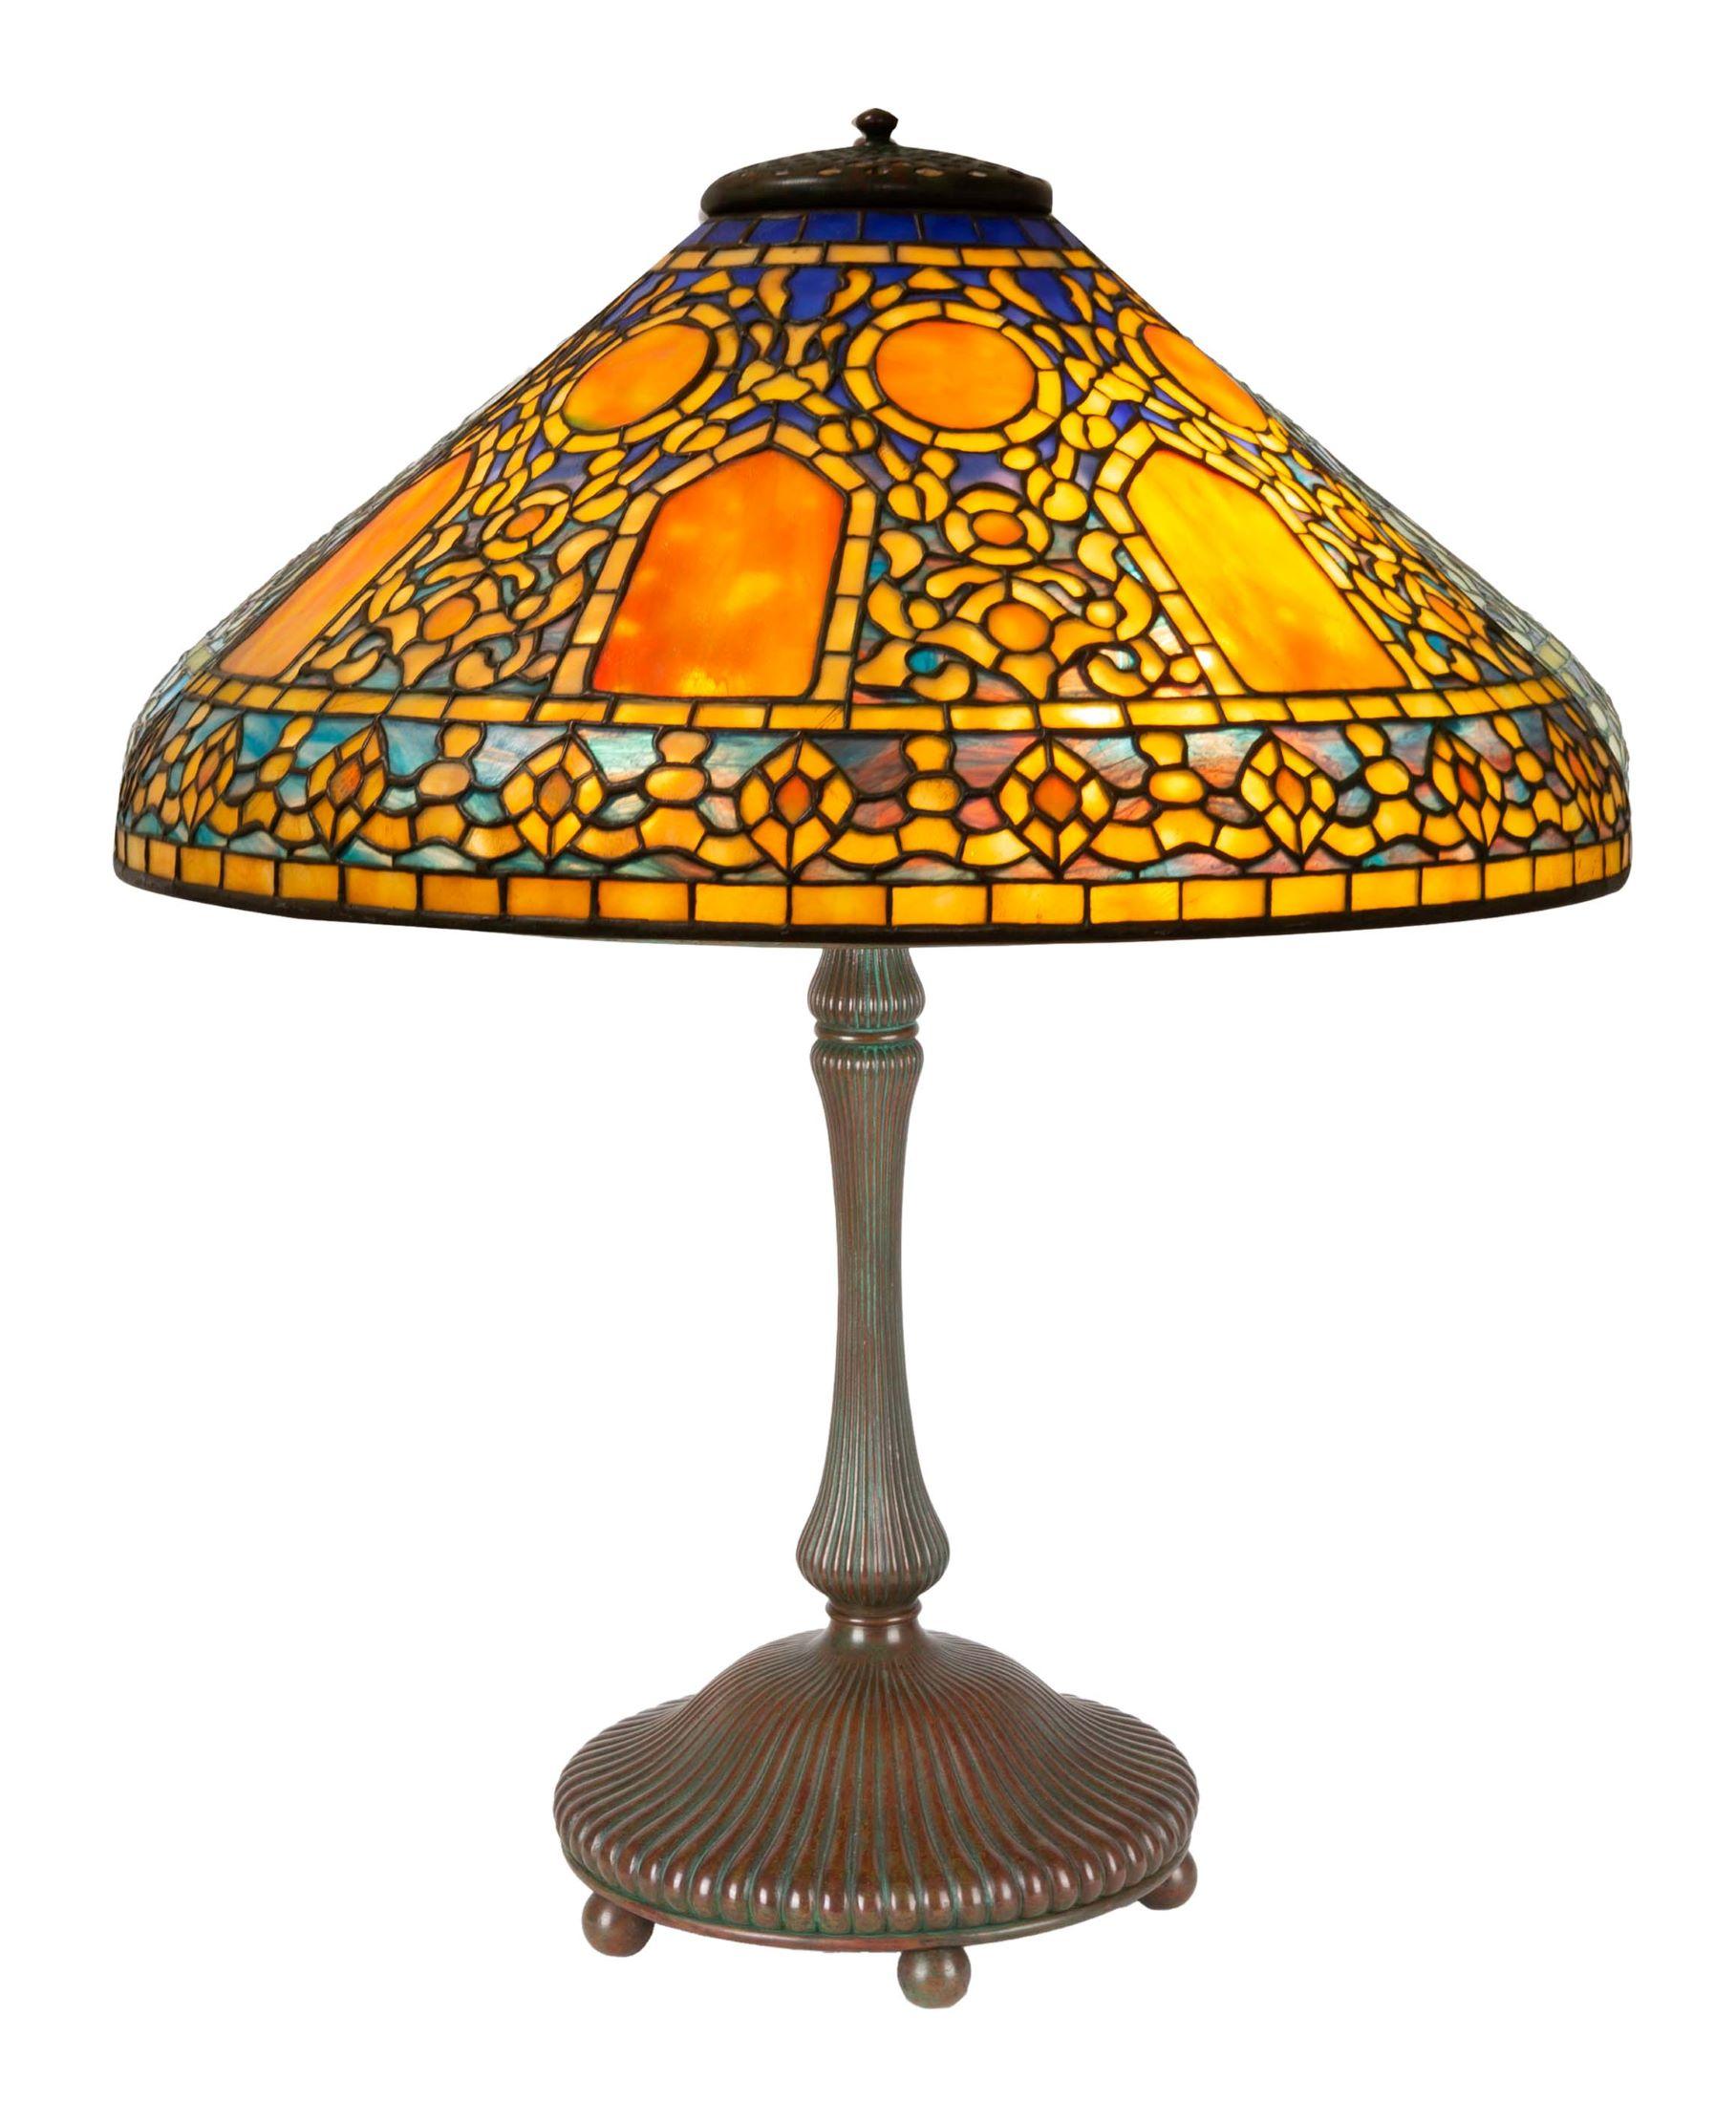 Lot 538, Tiffany Lamp